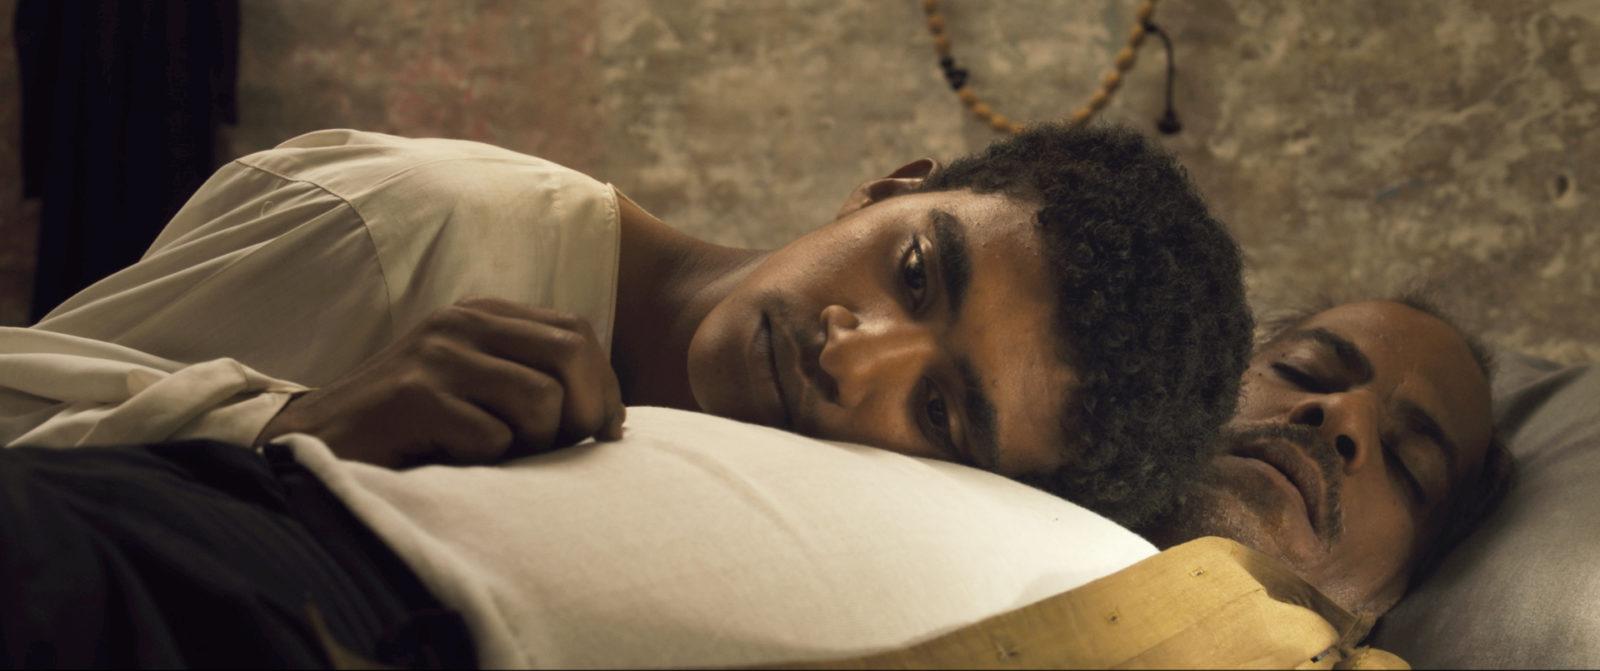 YOU WILL DIE AT TWENTY (Egypt/Sudan) - 2019